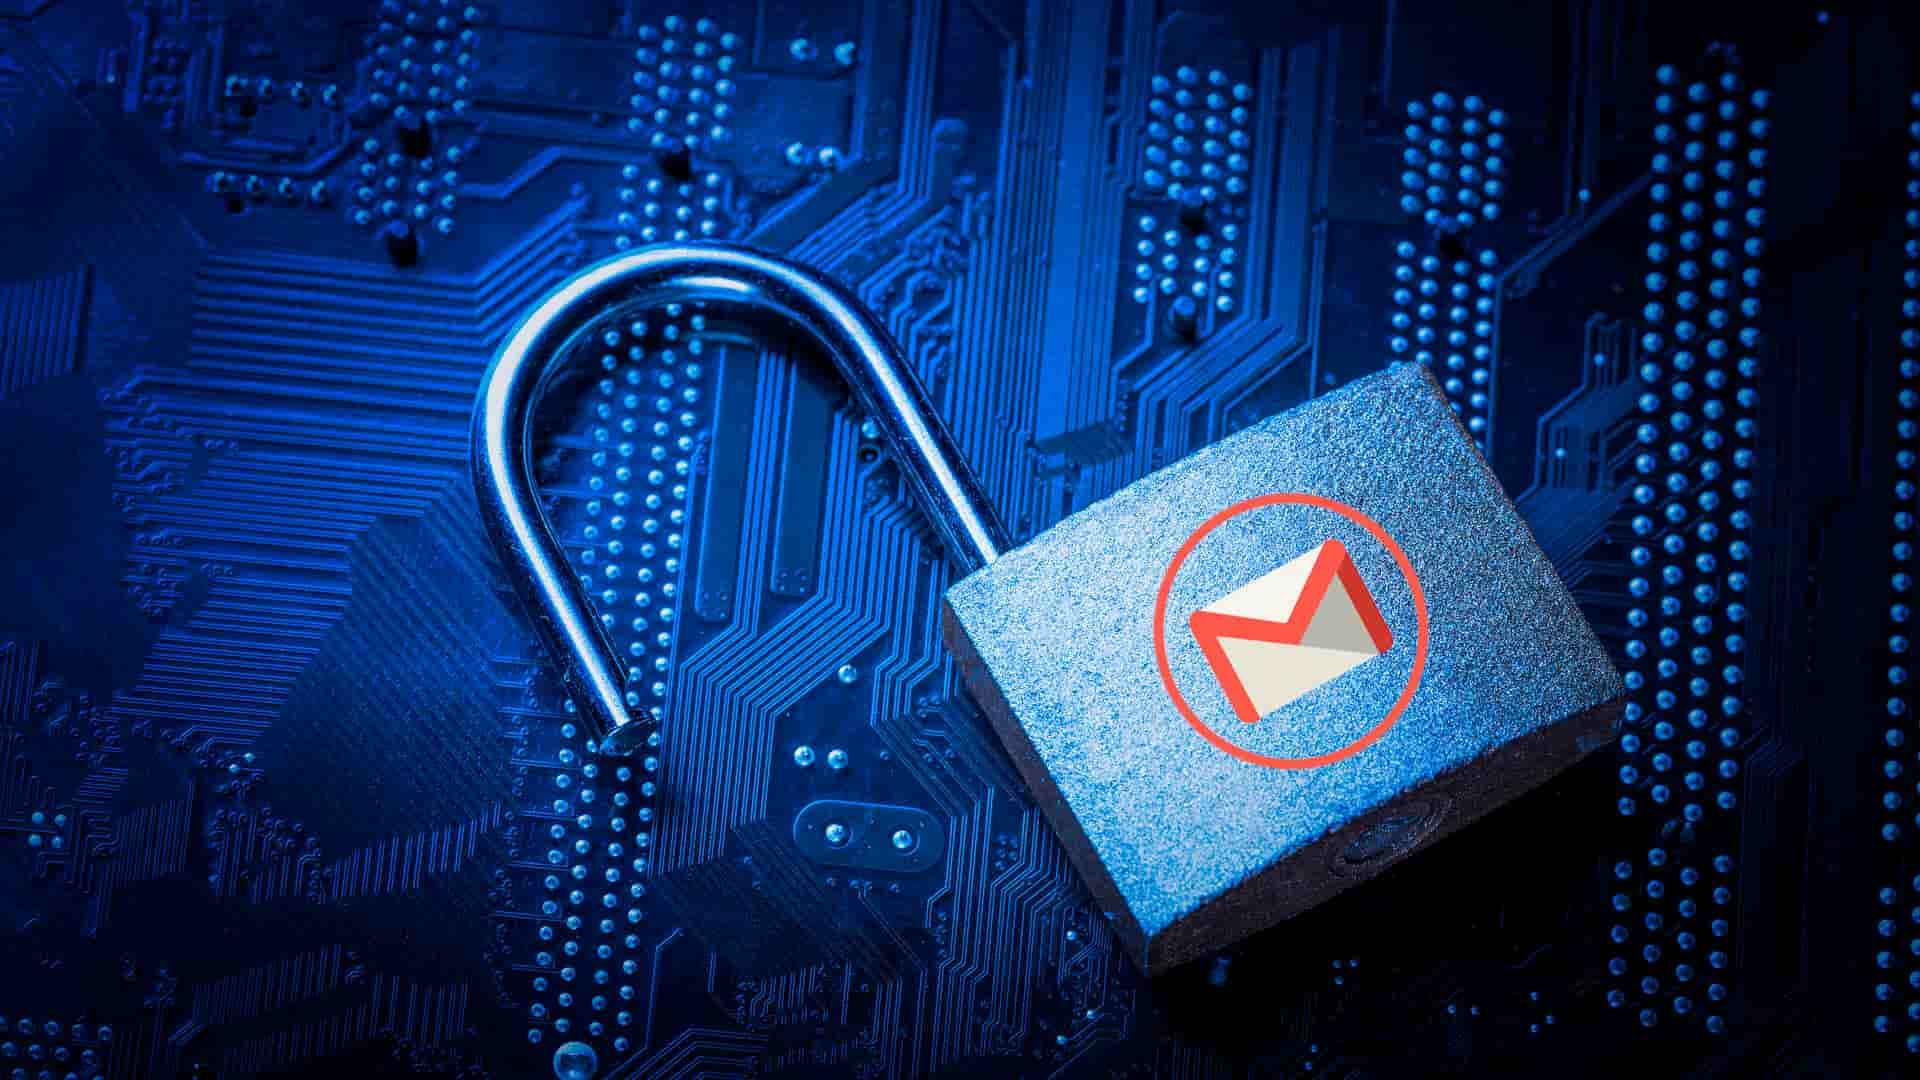 Acesso ilegitimo a contas de correio eletrónico netSegura